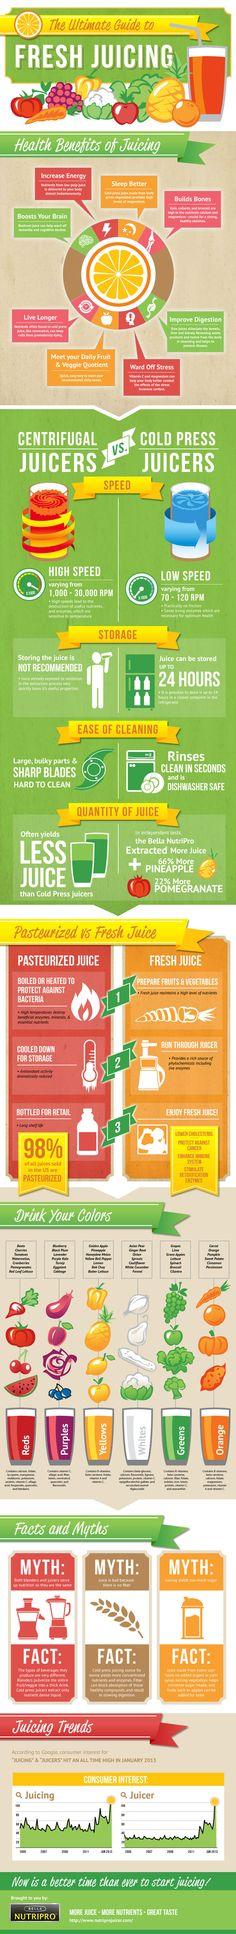 Infograph on fresh juicing. Ninan verkkareissa - Blogi | Lily.fi